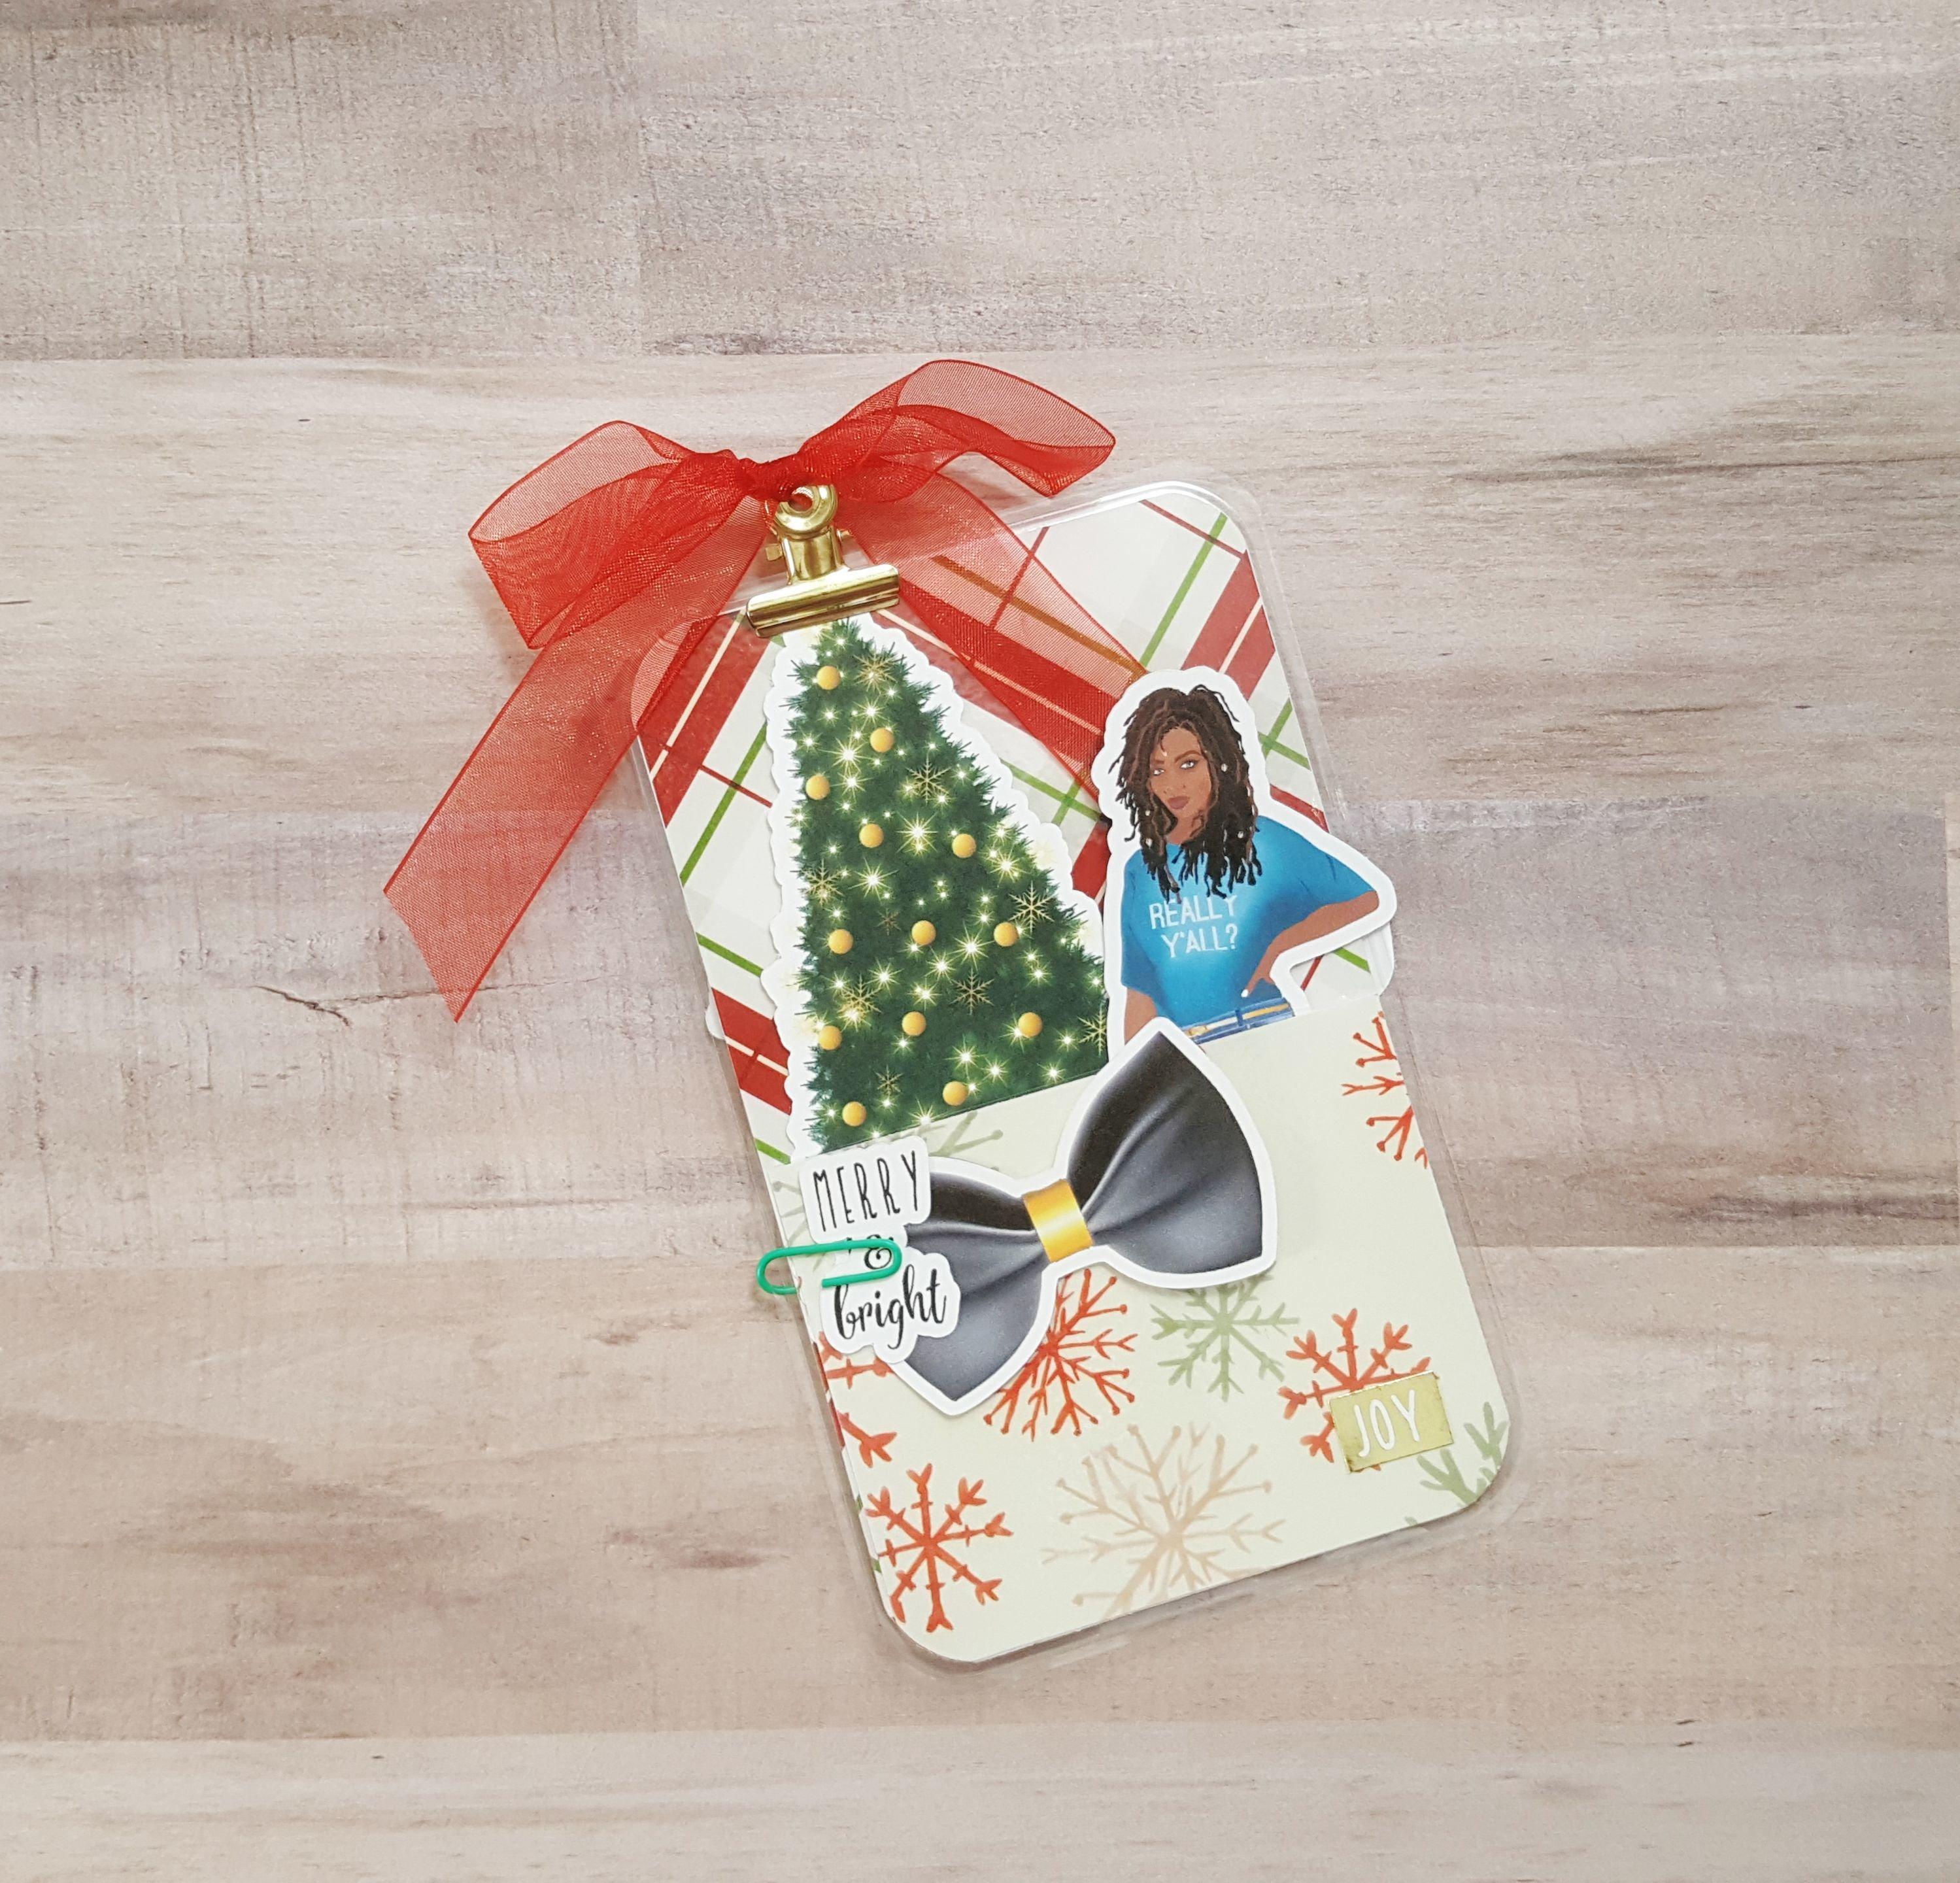 Joy Holiday Cheer Pocket Size Loaded Page Marker 20171105-01